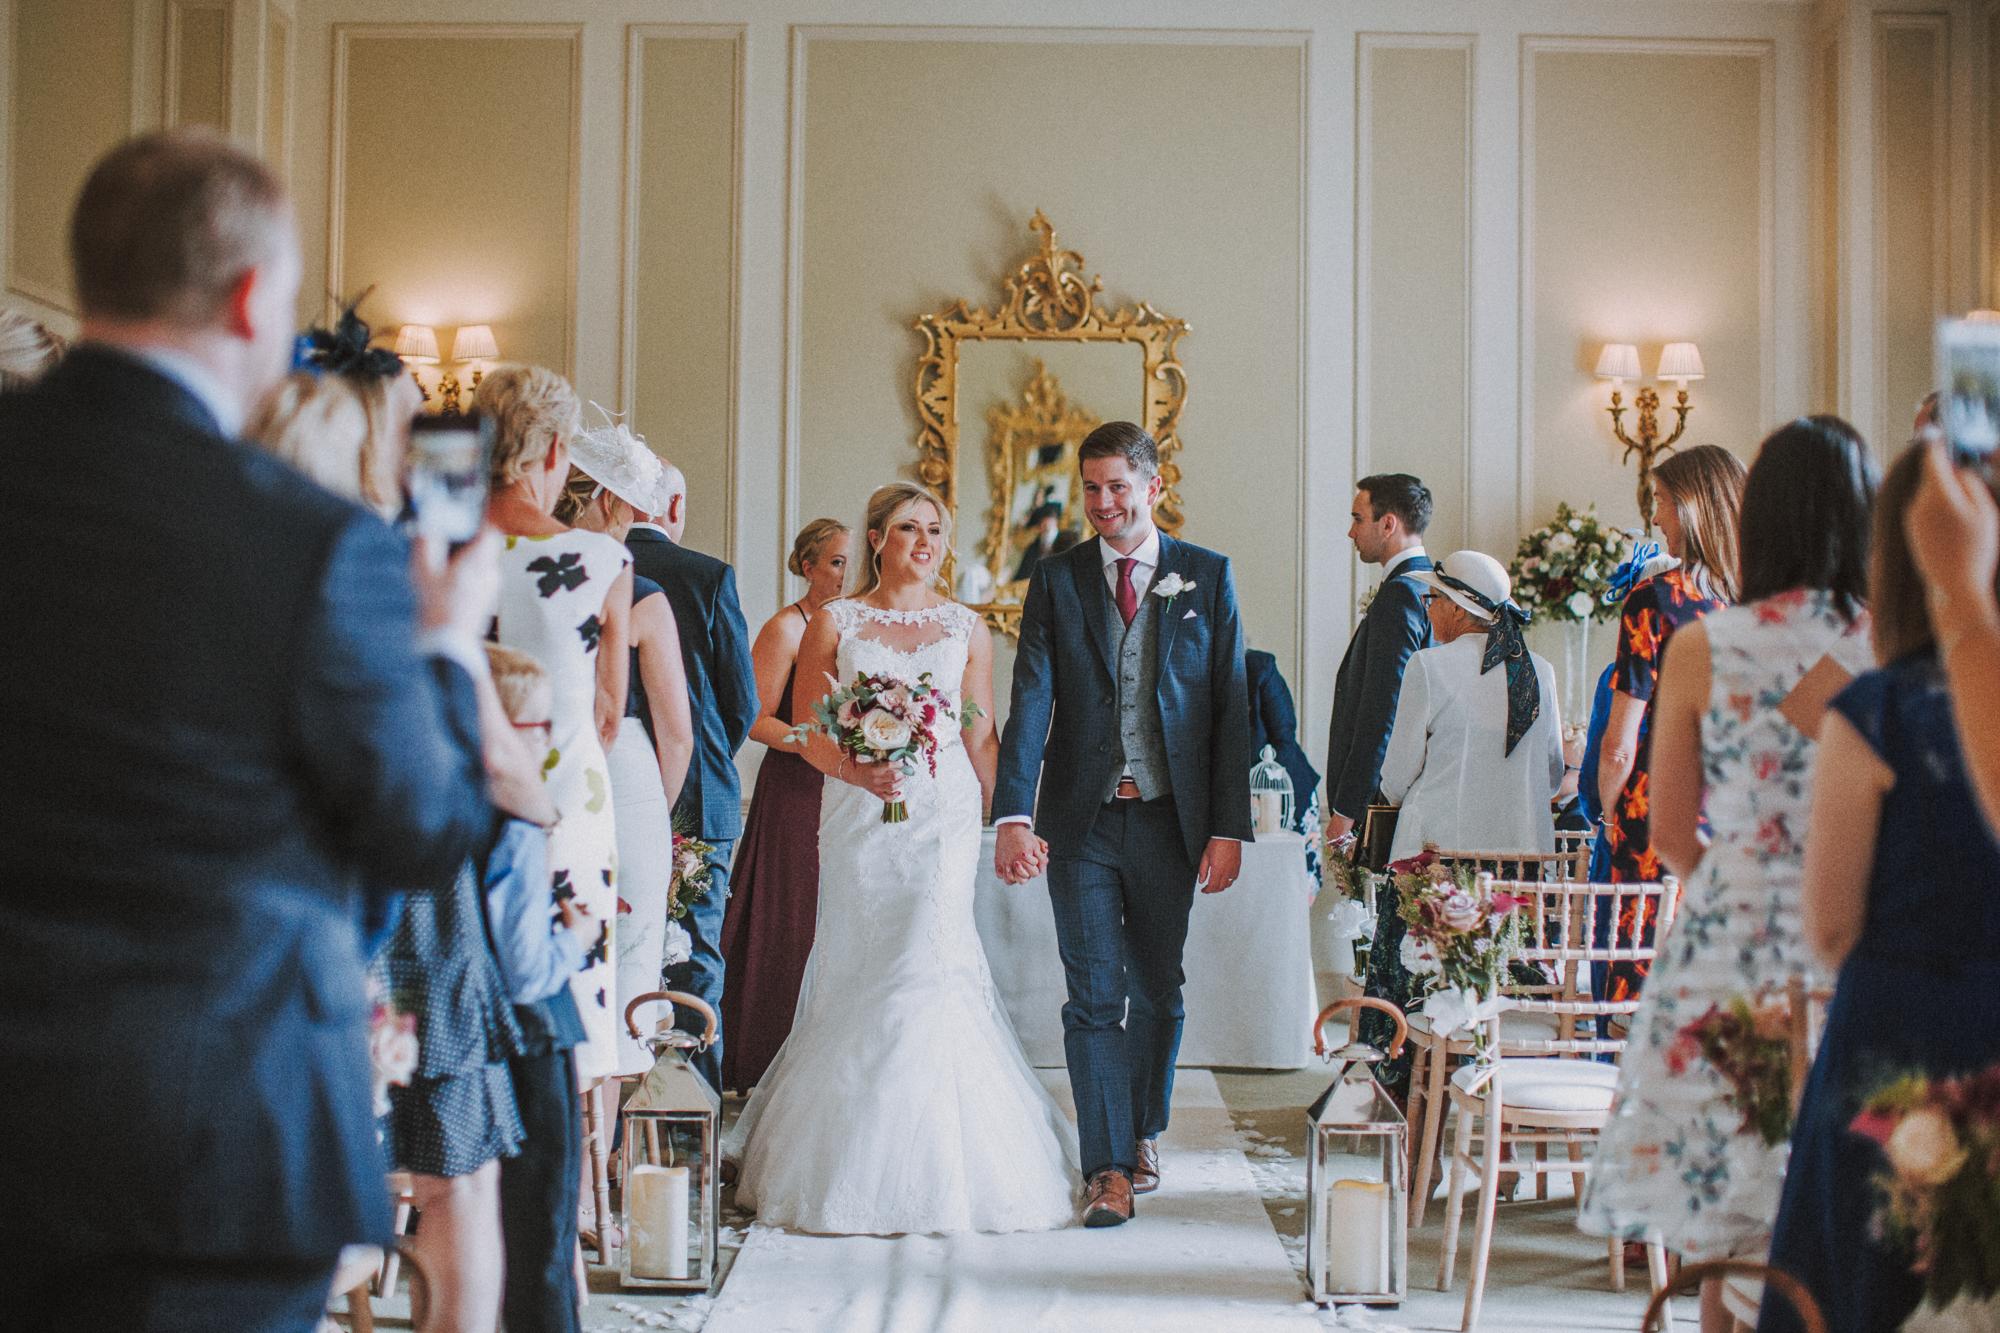 bowcliffe hall wedding photographers yorkshire-28.jpg